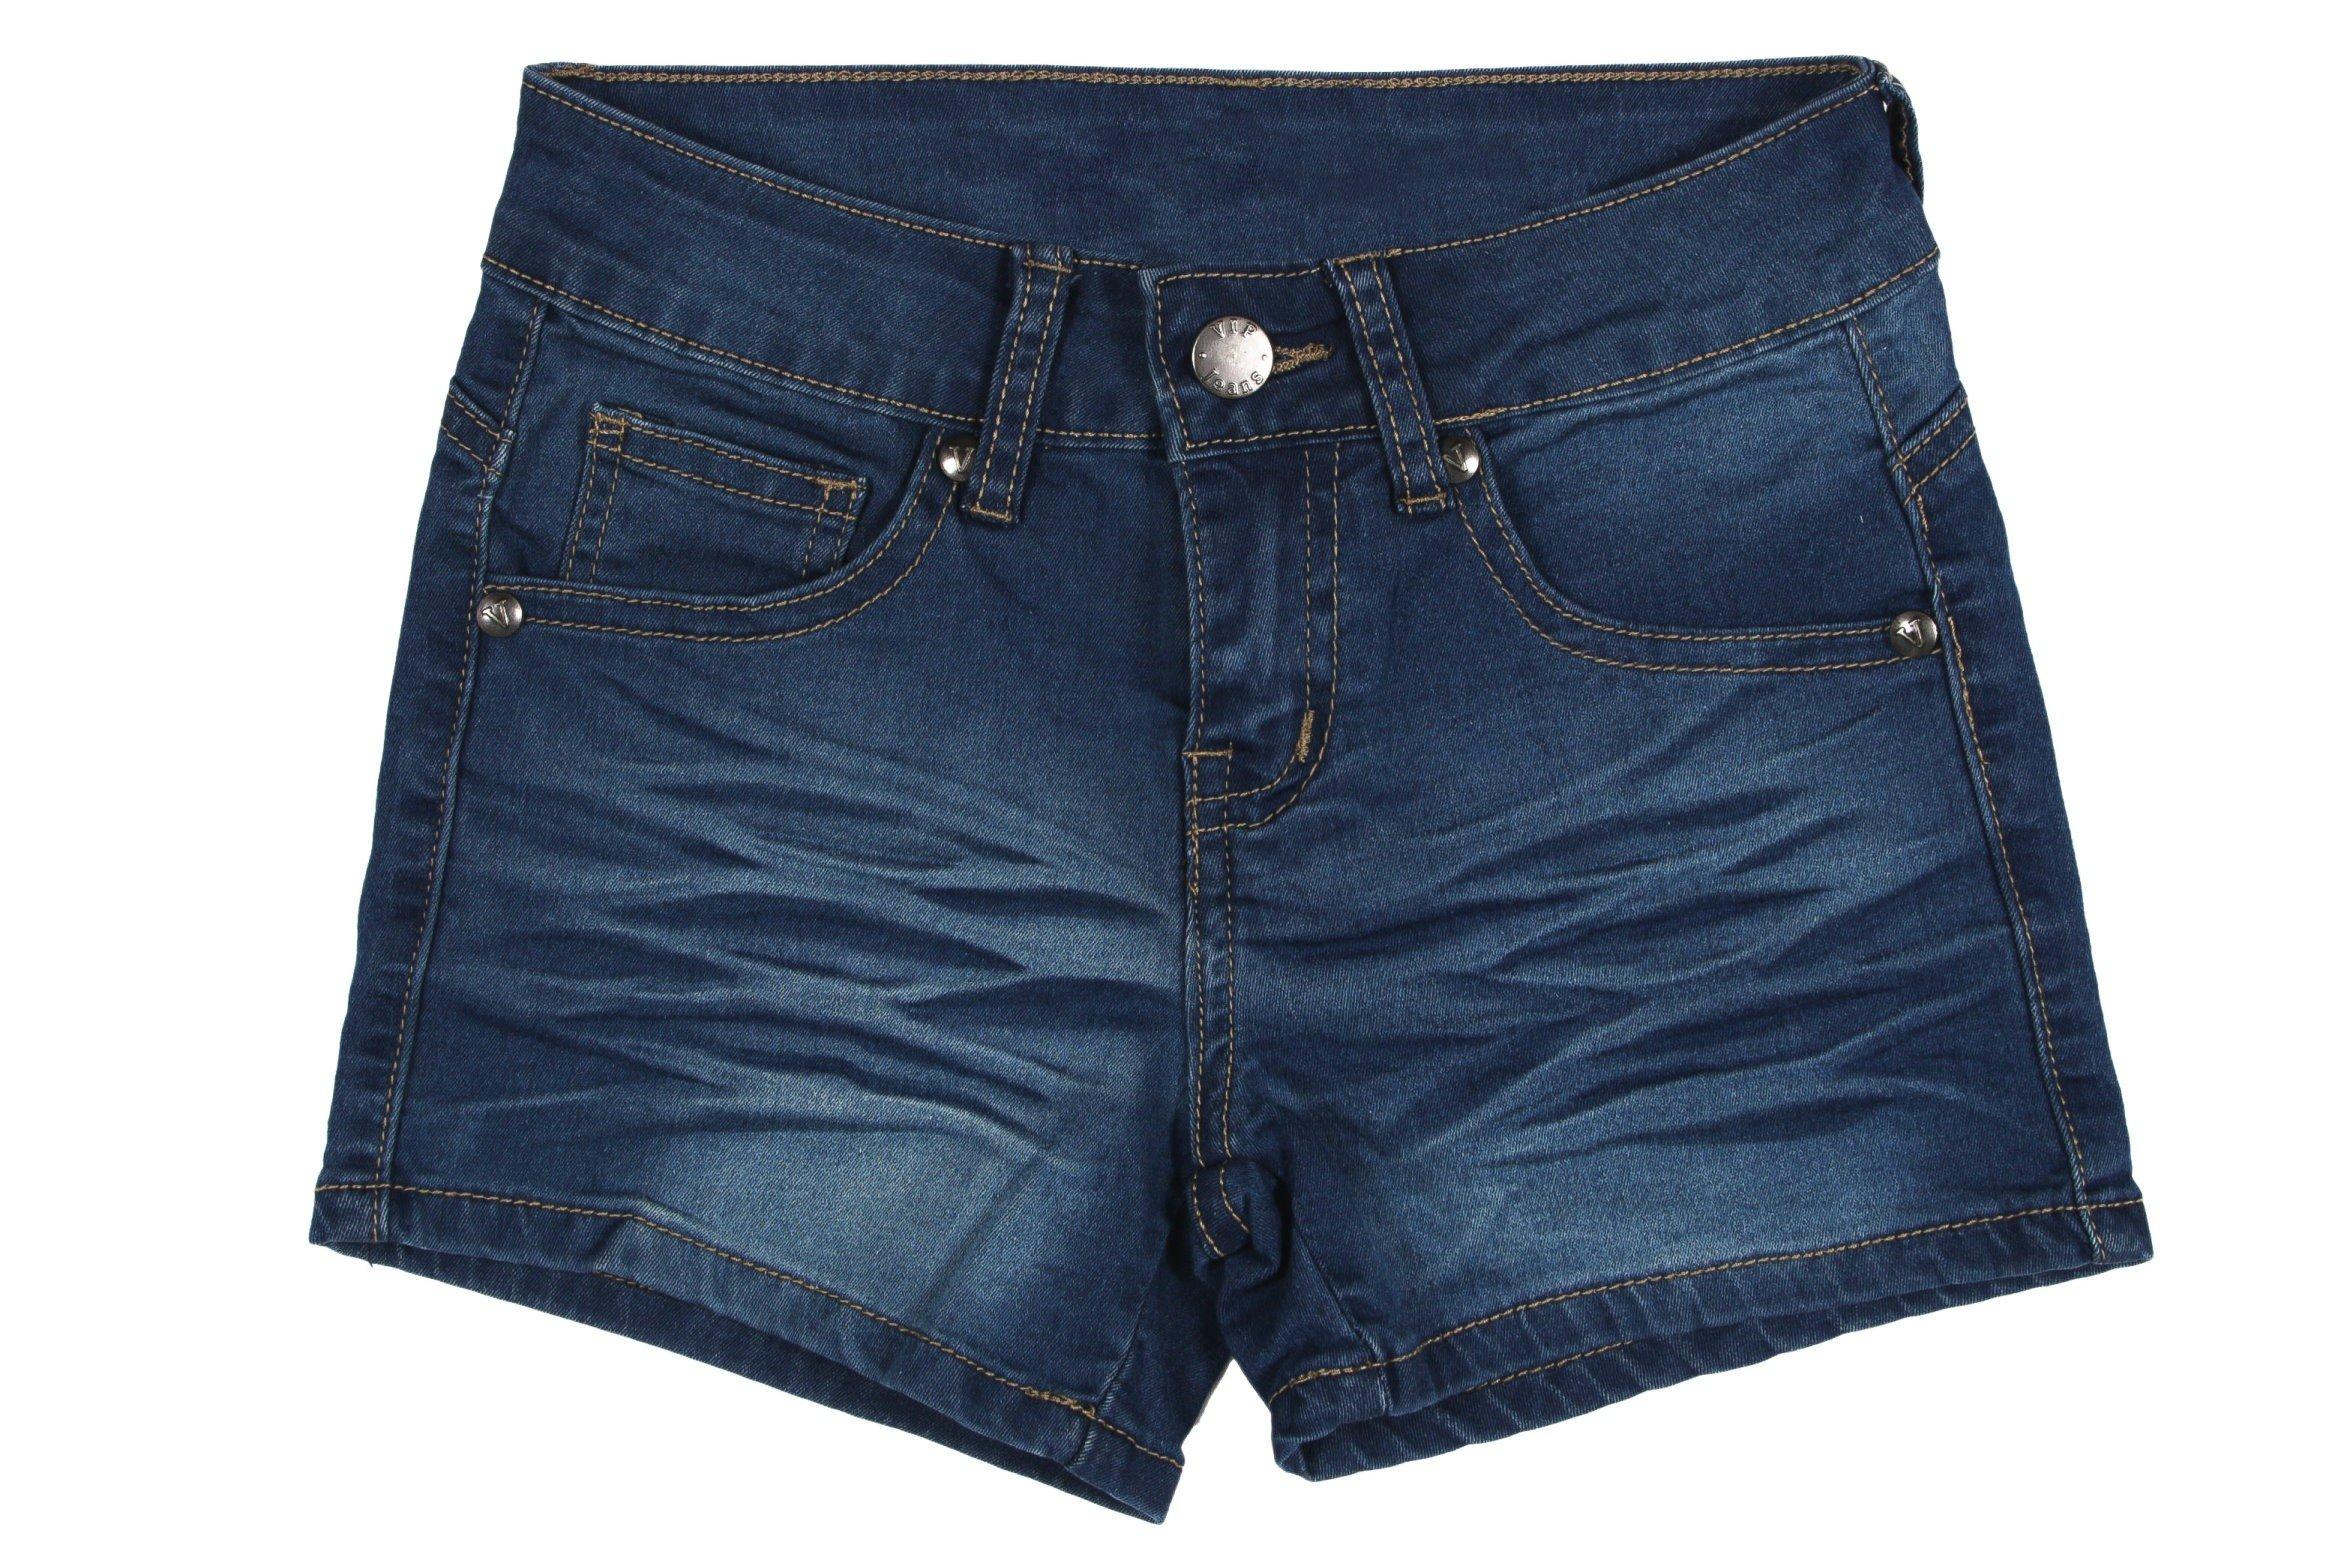 K9-8399B(SH) - Girls' Stretch 5 Pockets Premium Stretch Denim Shorts in Washed Blue Size 12 (MLG1)